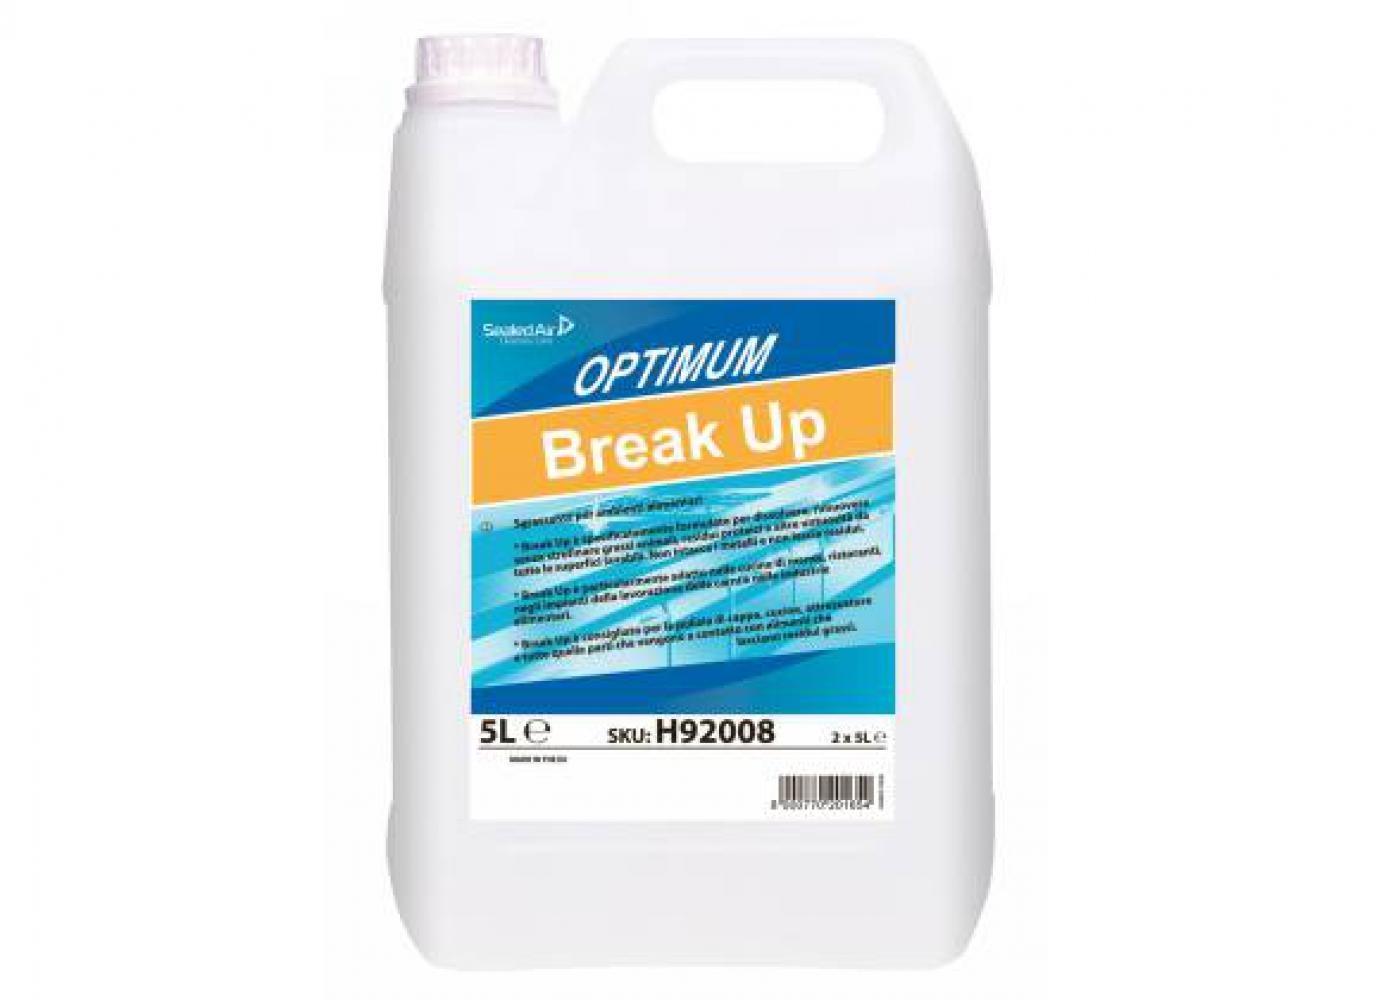 Acquista 2 Pezzi Optimum Break Up Kg 17545833 | Glooke.com